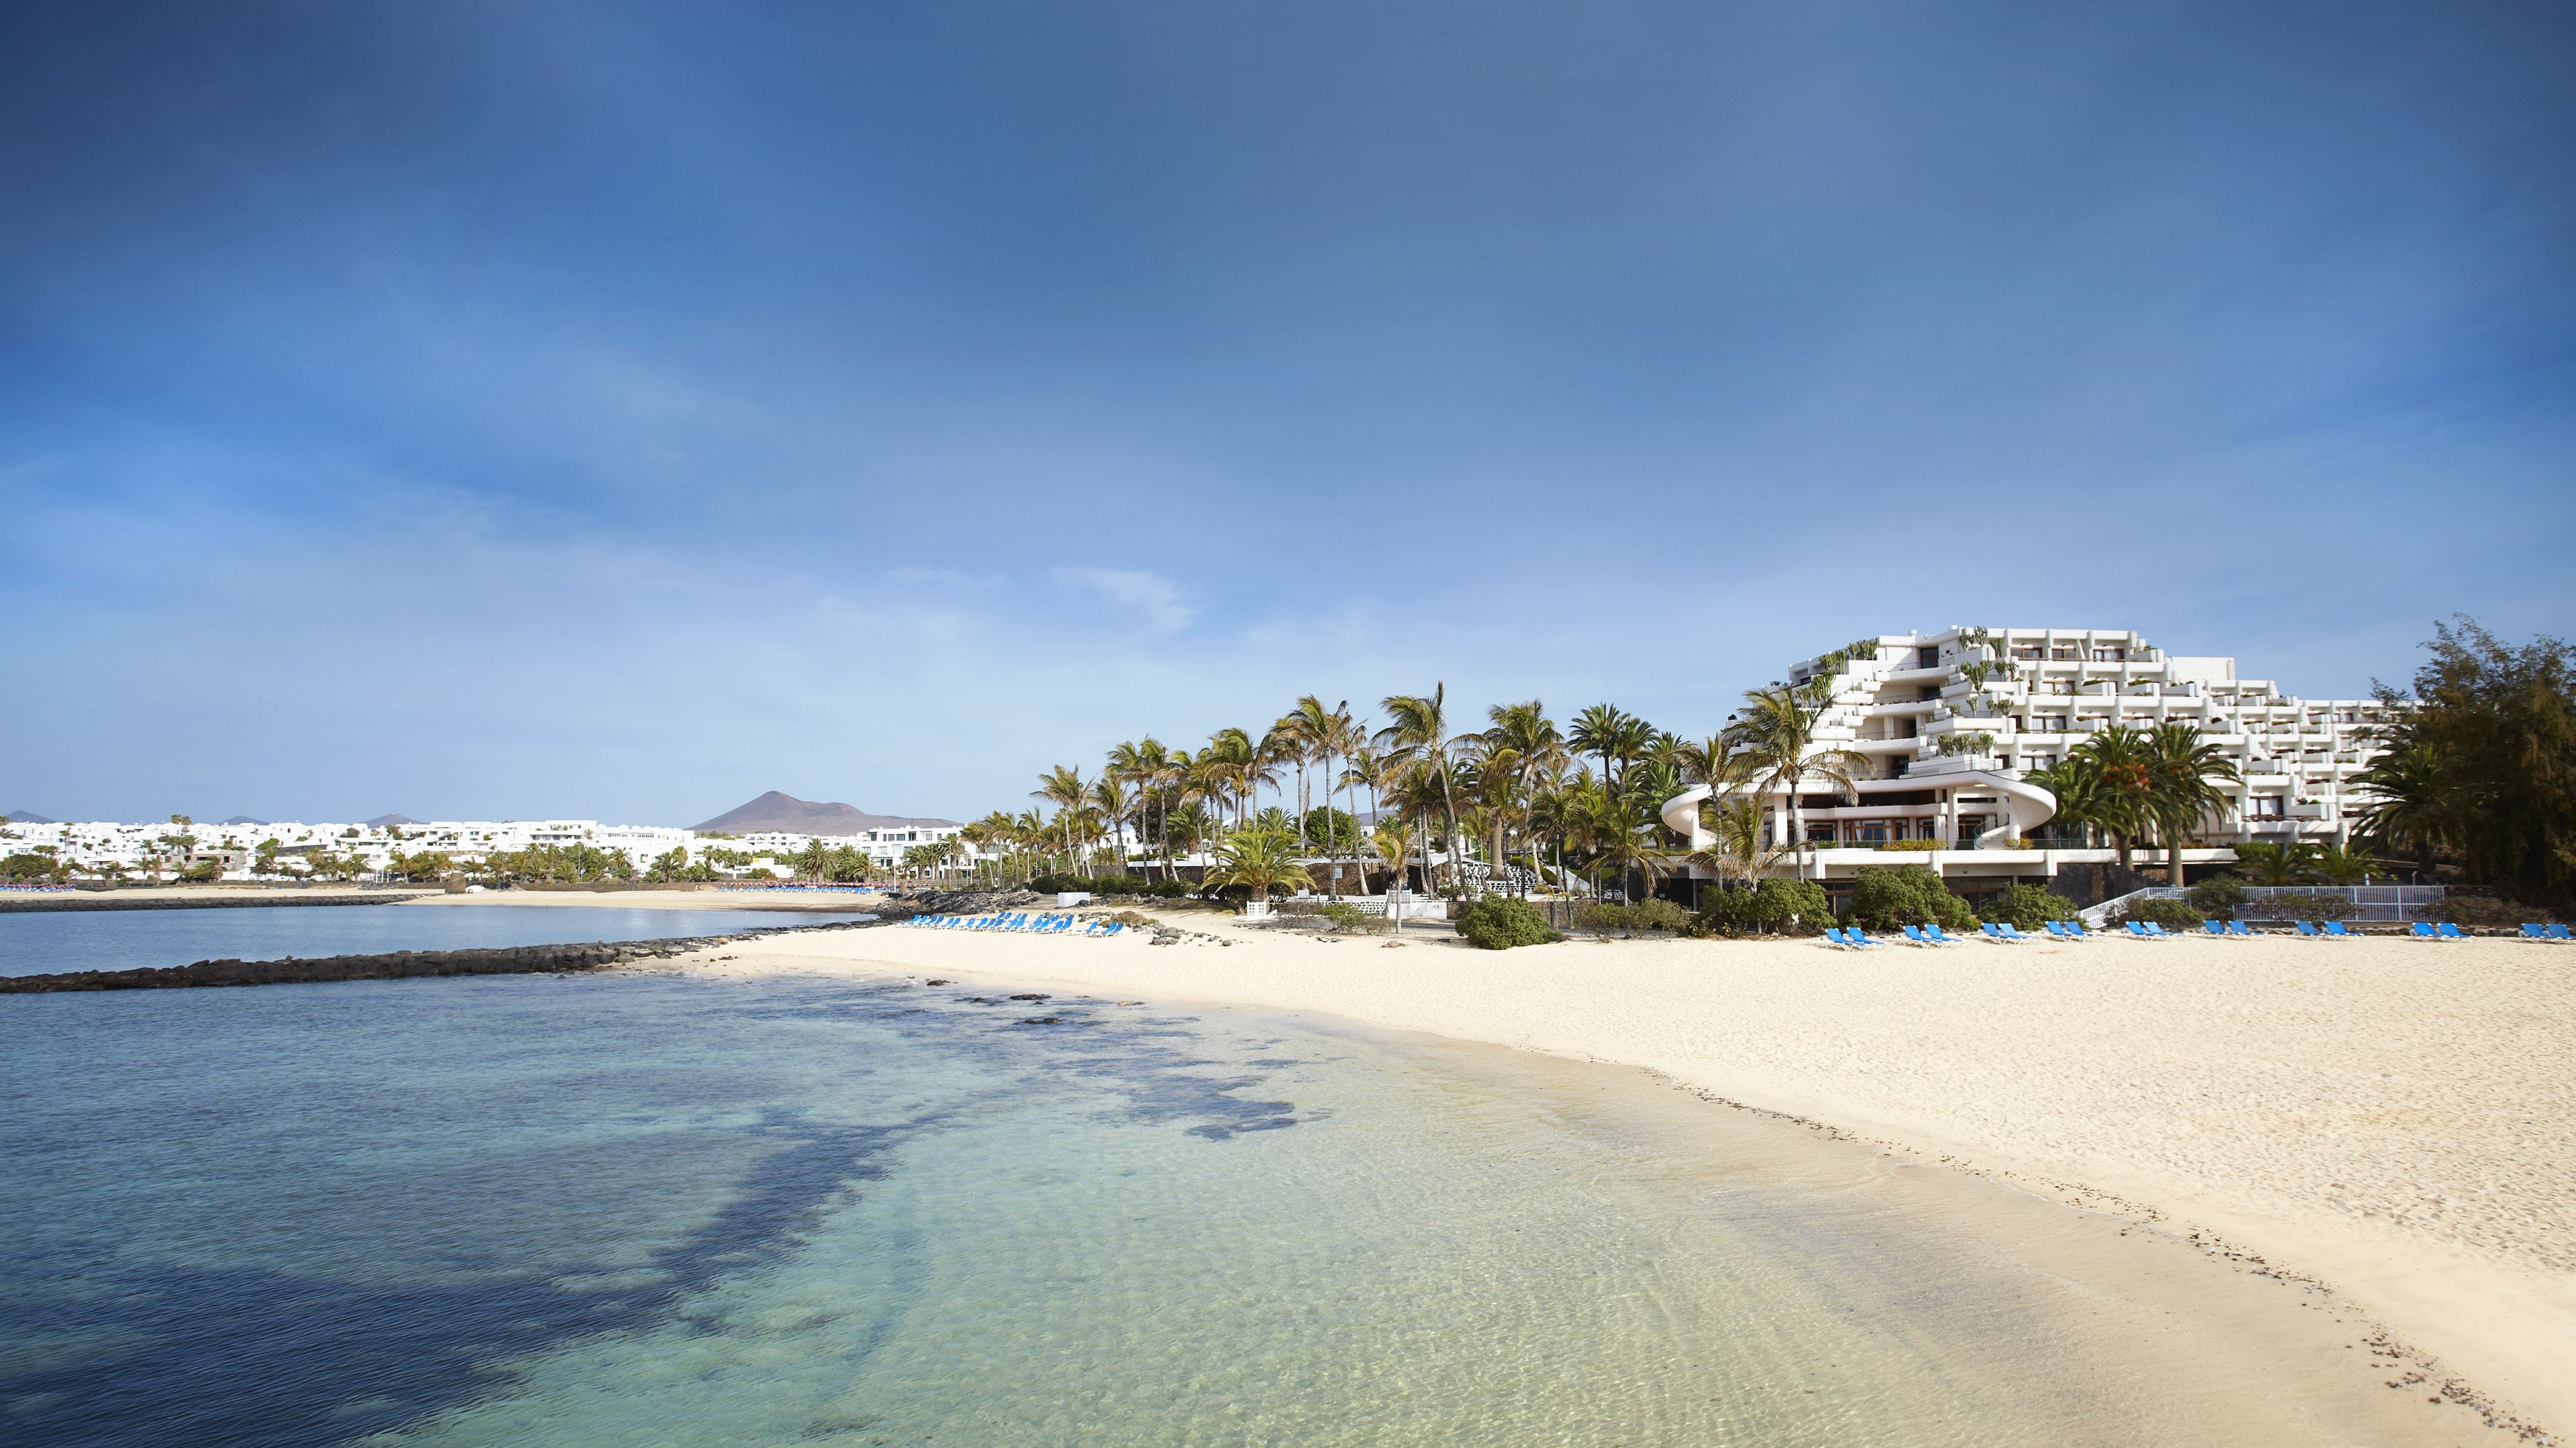 Hotell Melia Salinas, Costa Teguise Lanzarote